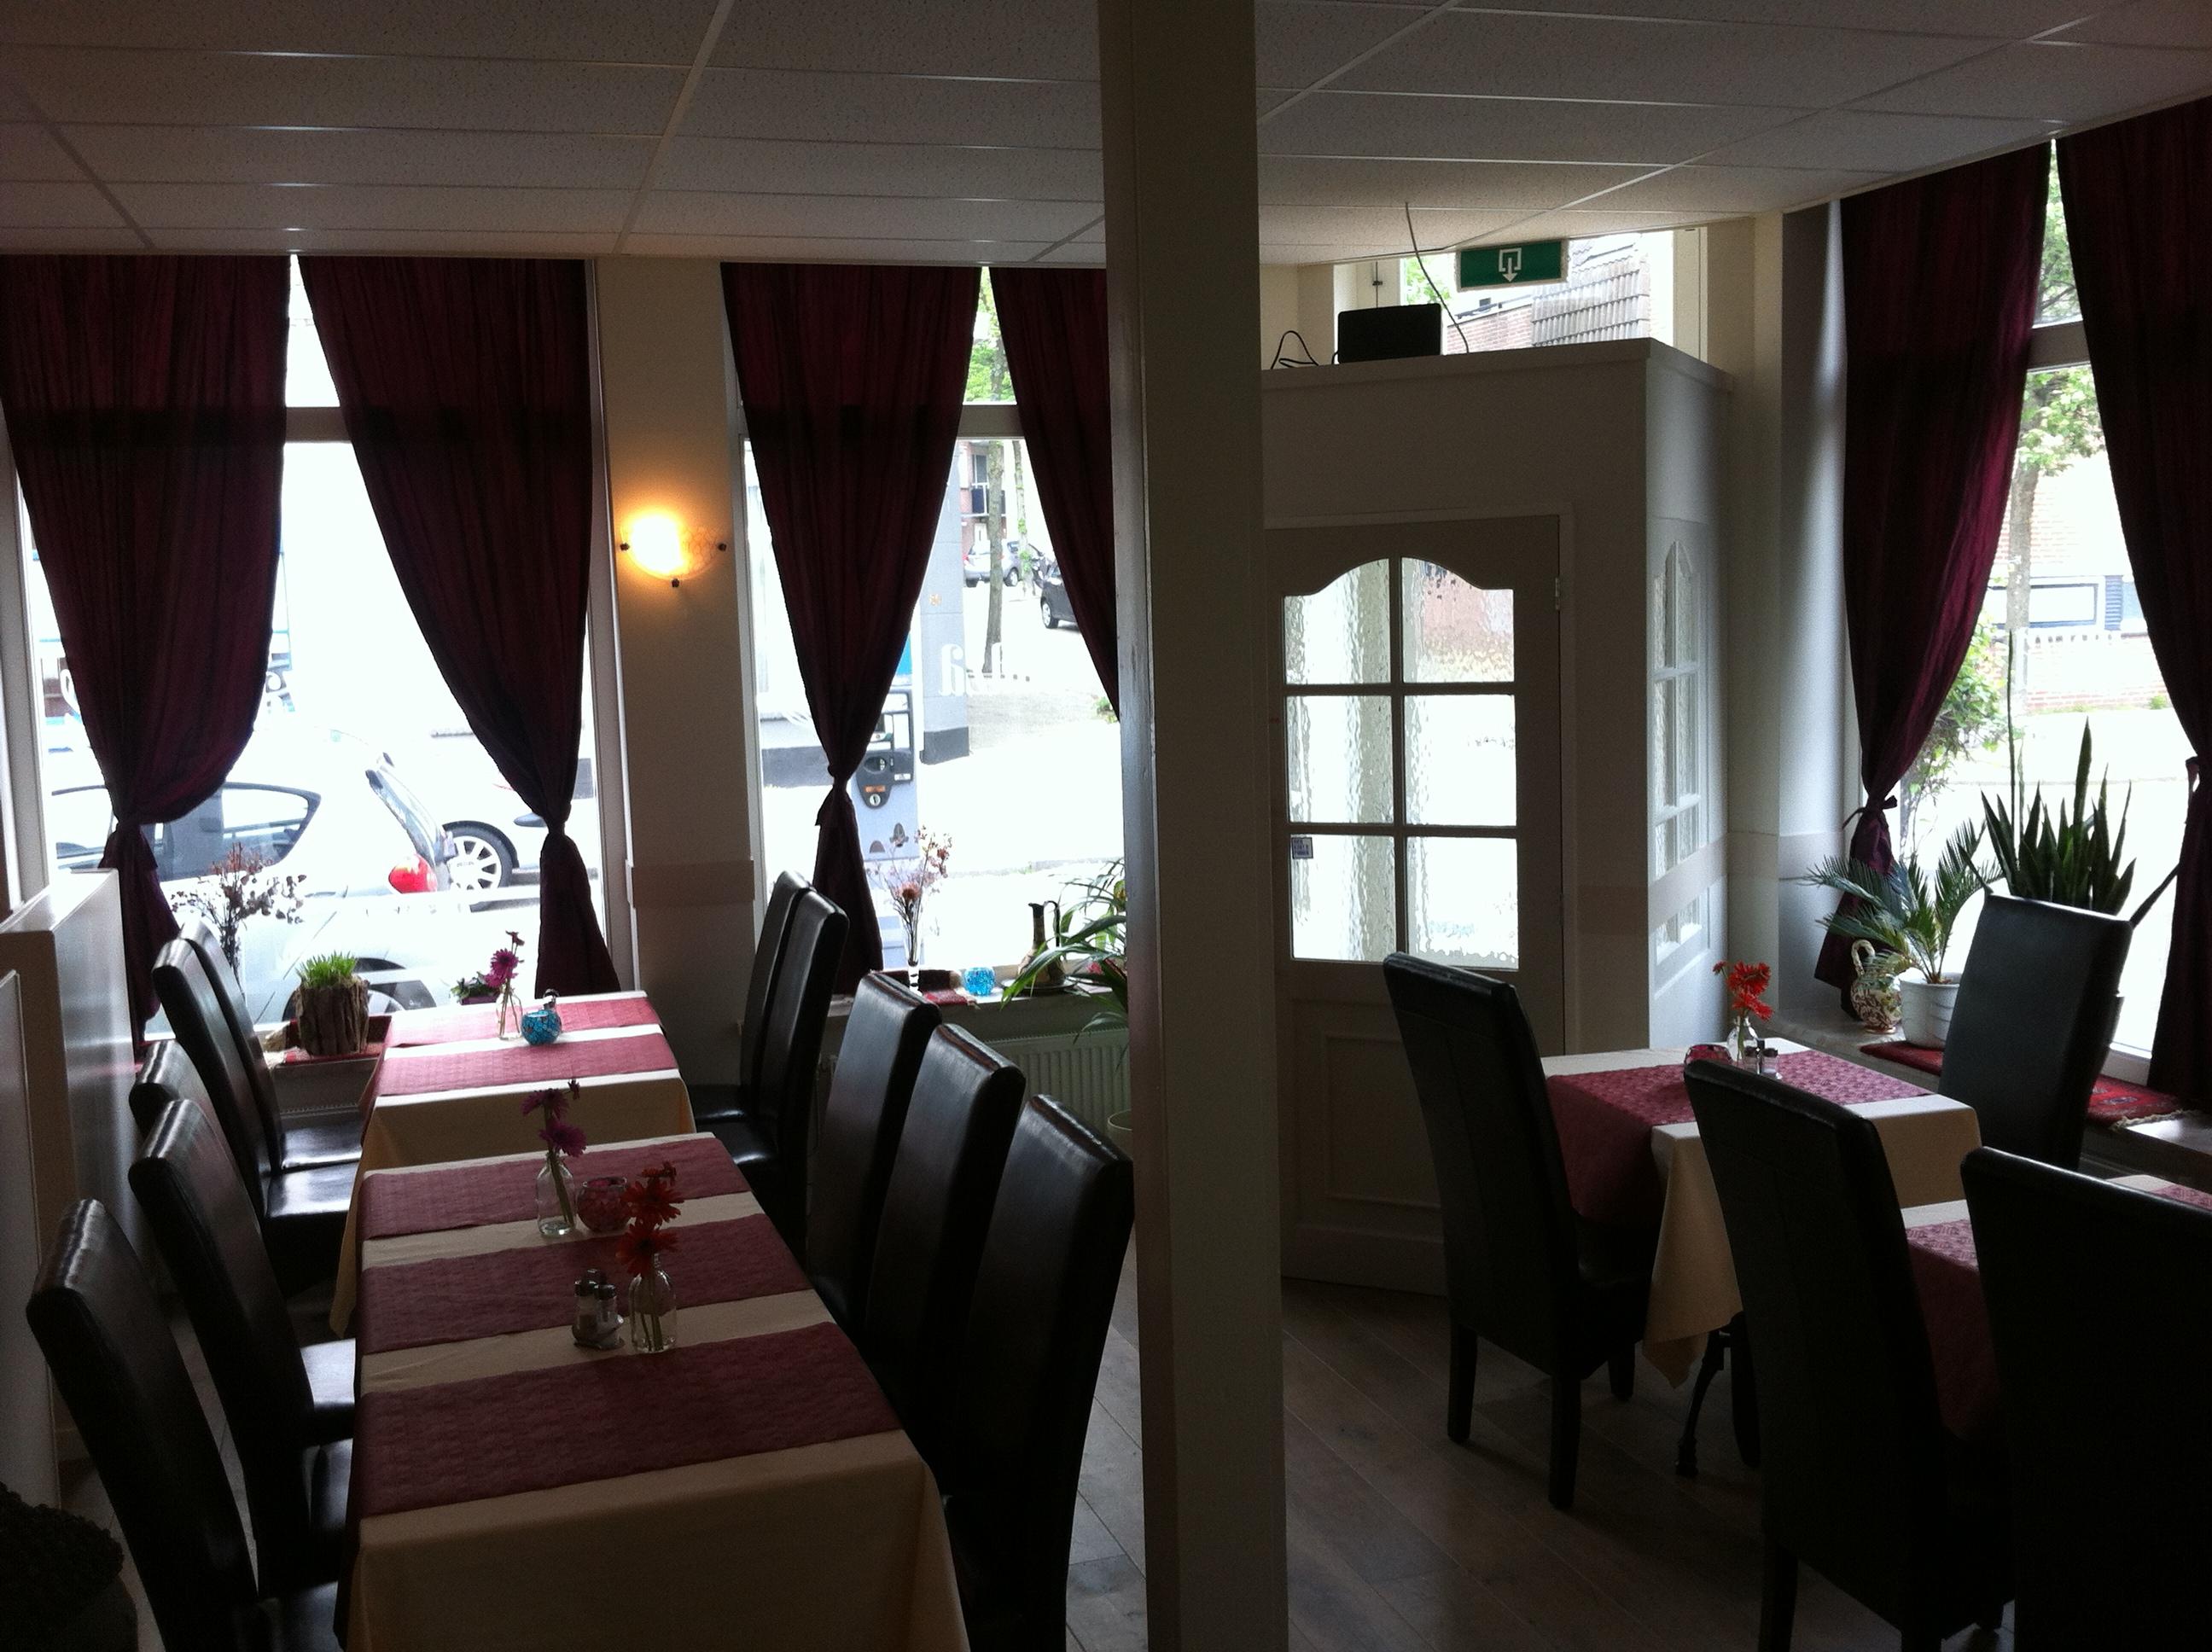 Bergen op Zoom - Cafetaria & Afghaans Restaurant te koop |